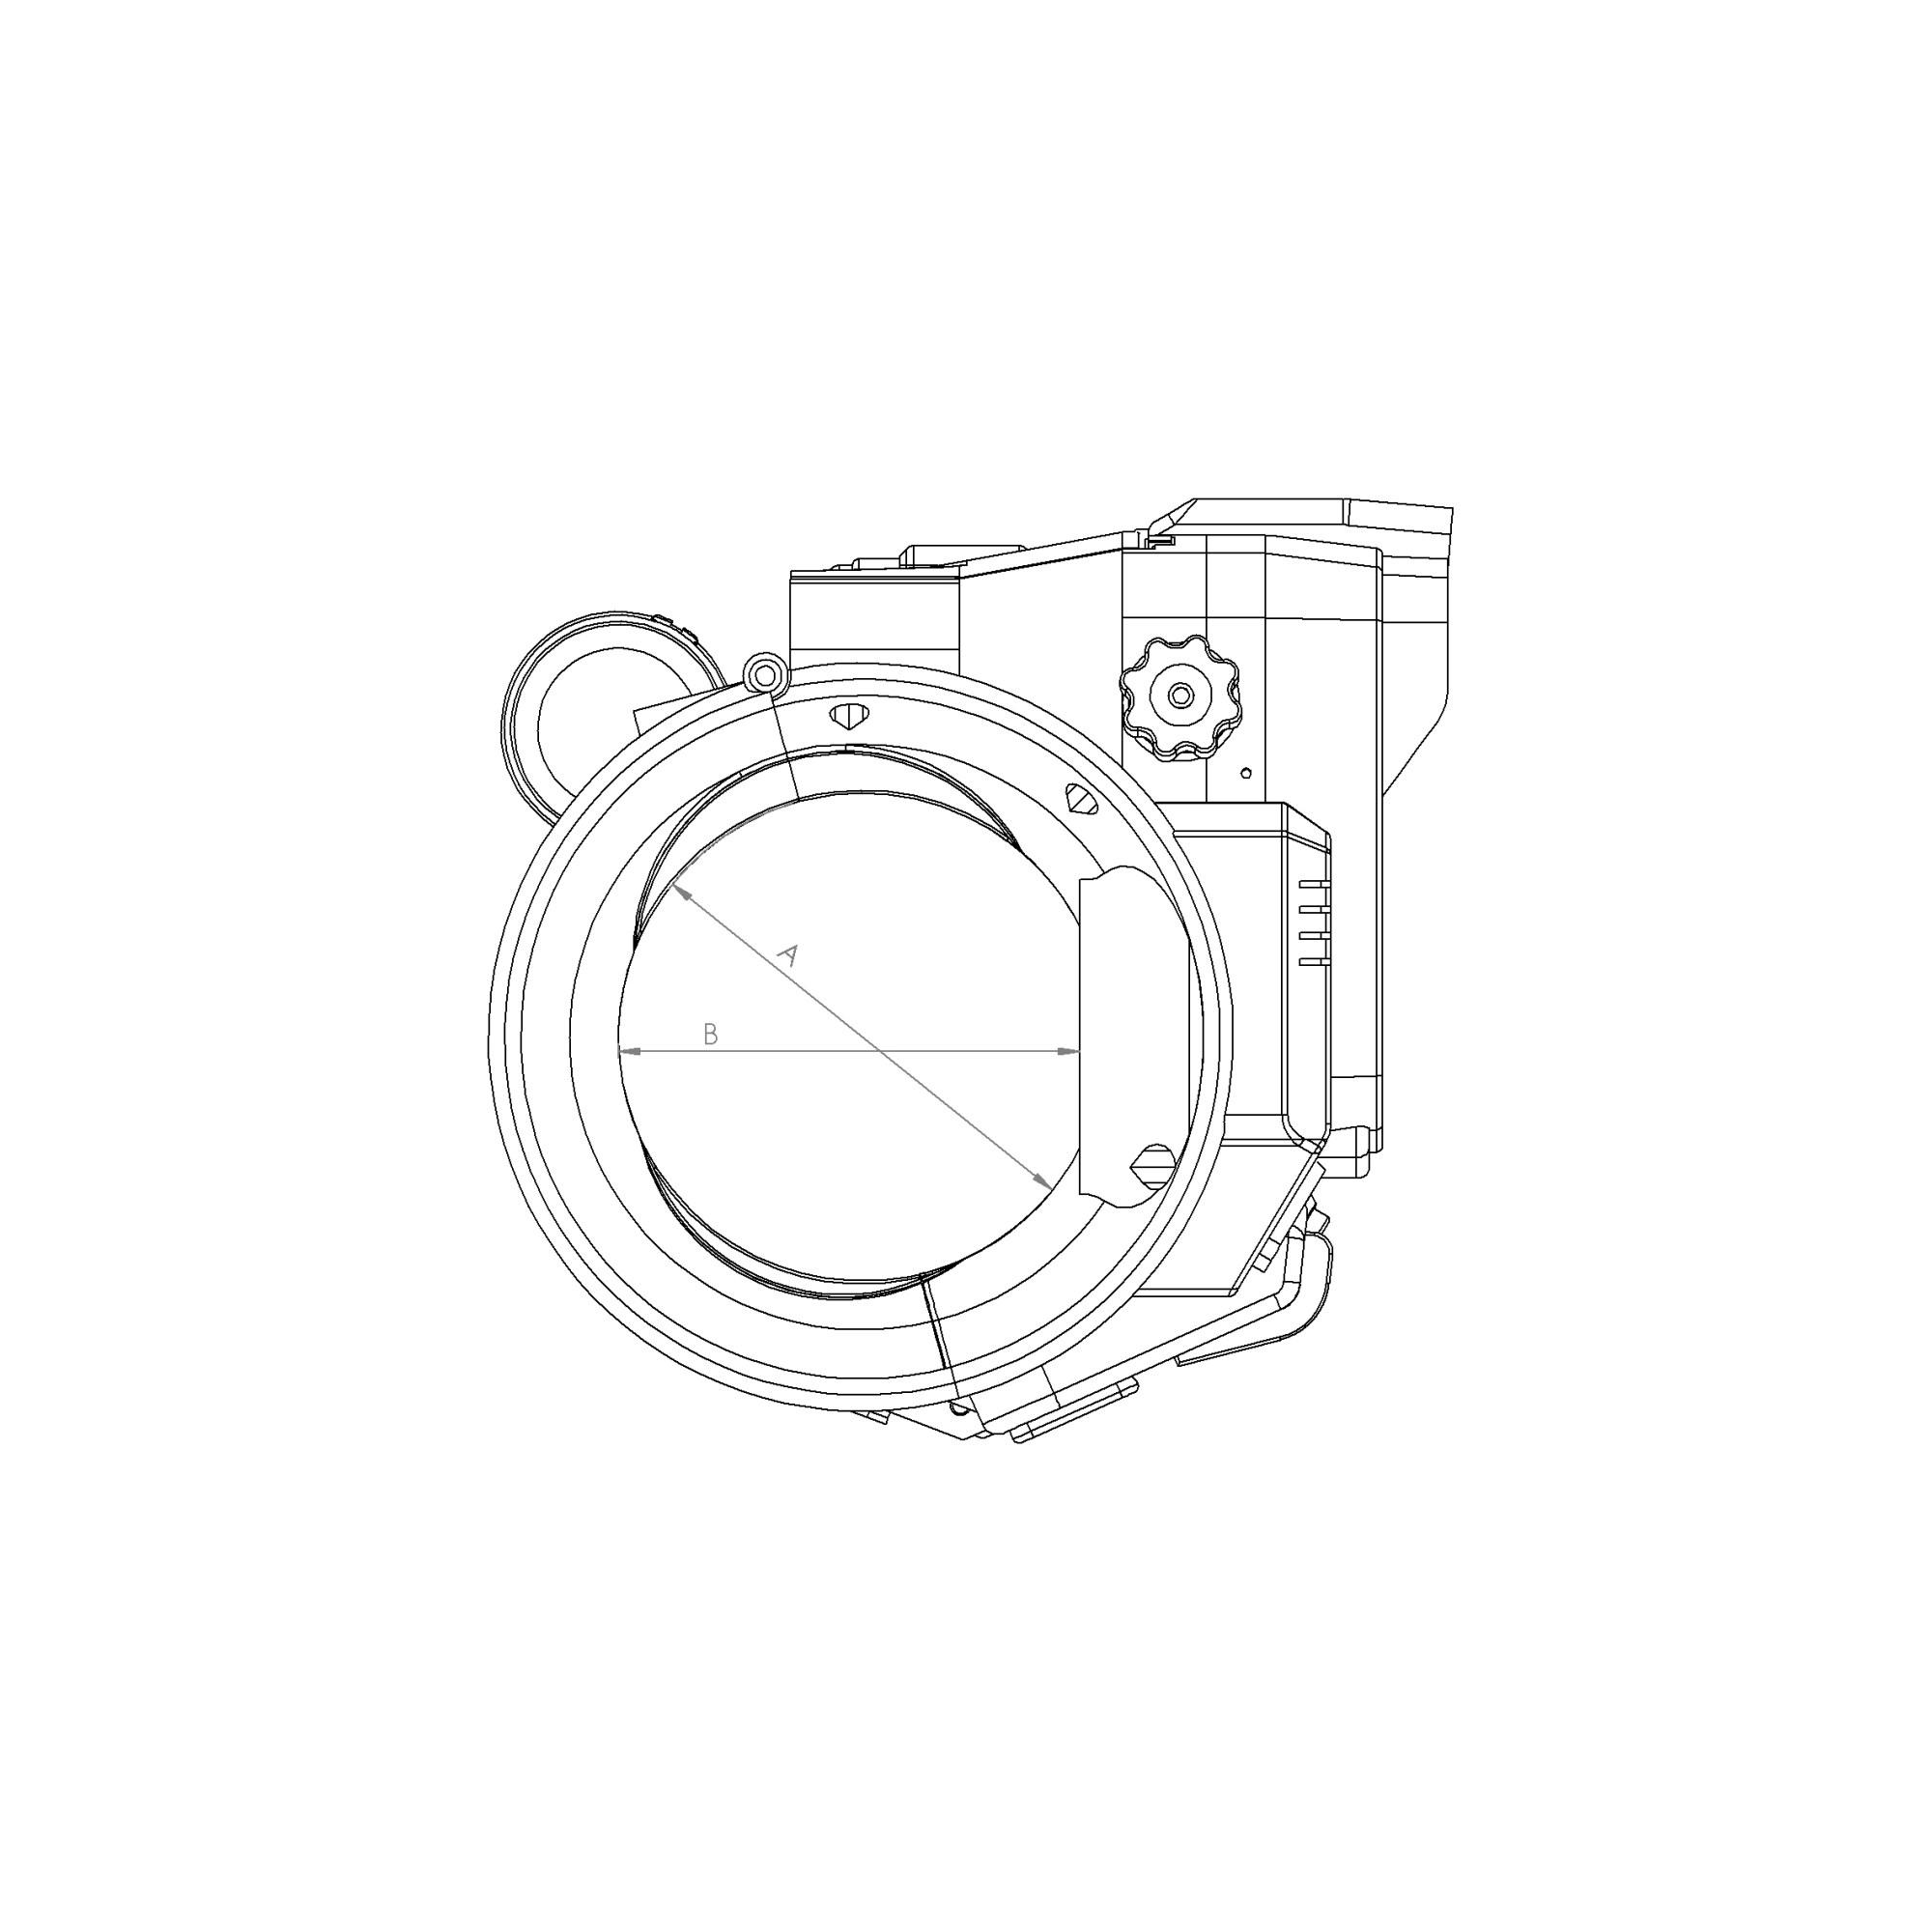 hight resolution of pb3k mk4 phone dimensions 1